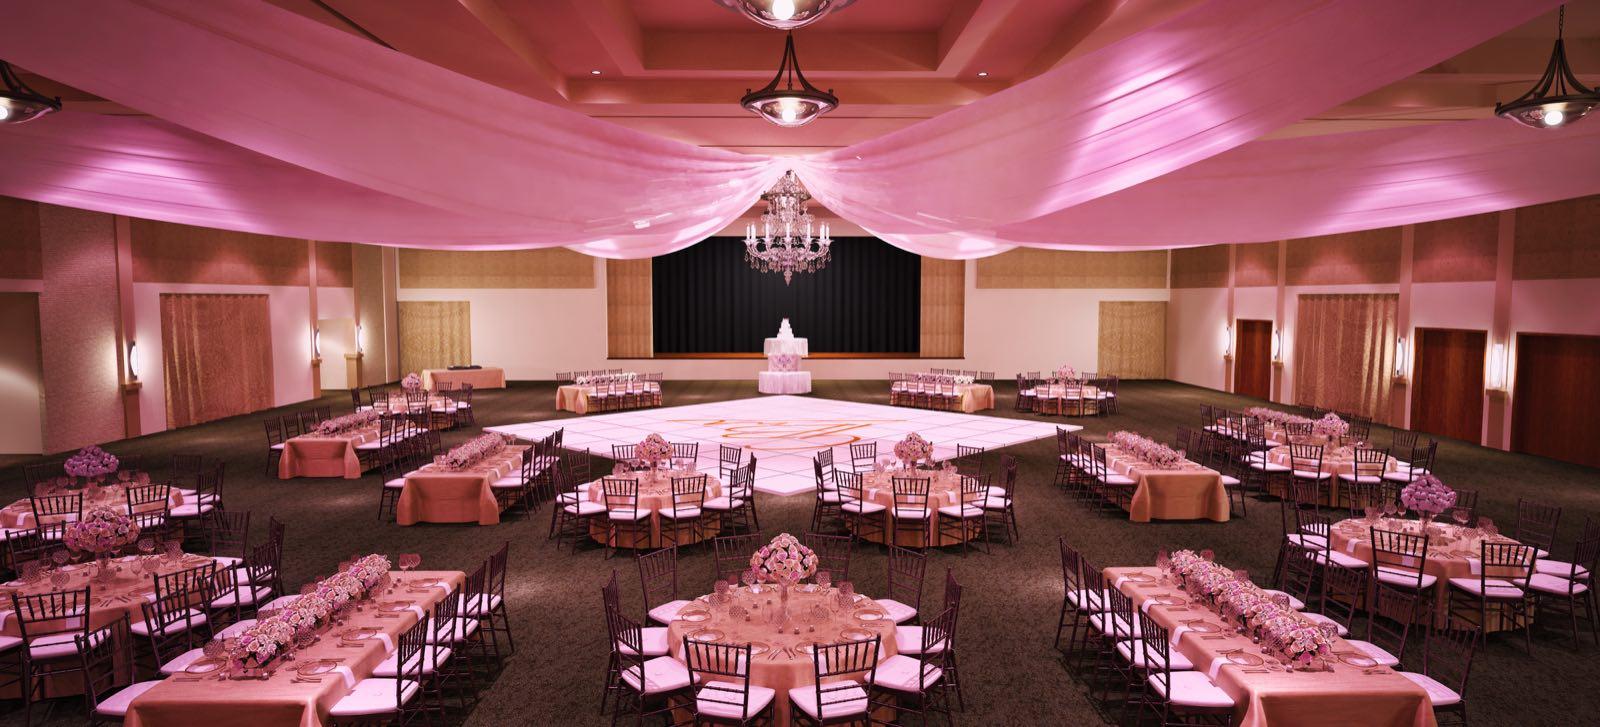 Event Venues Tampa FL   Affordable Wedding Reception Venue   Meeting ...